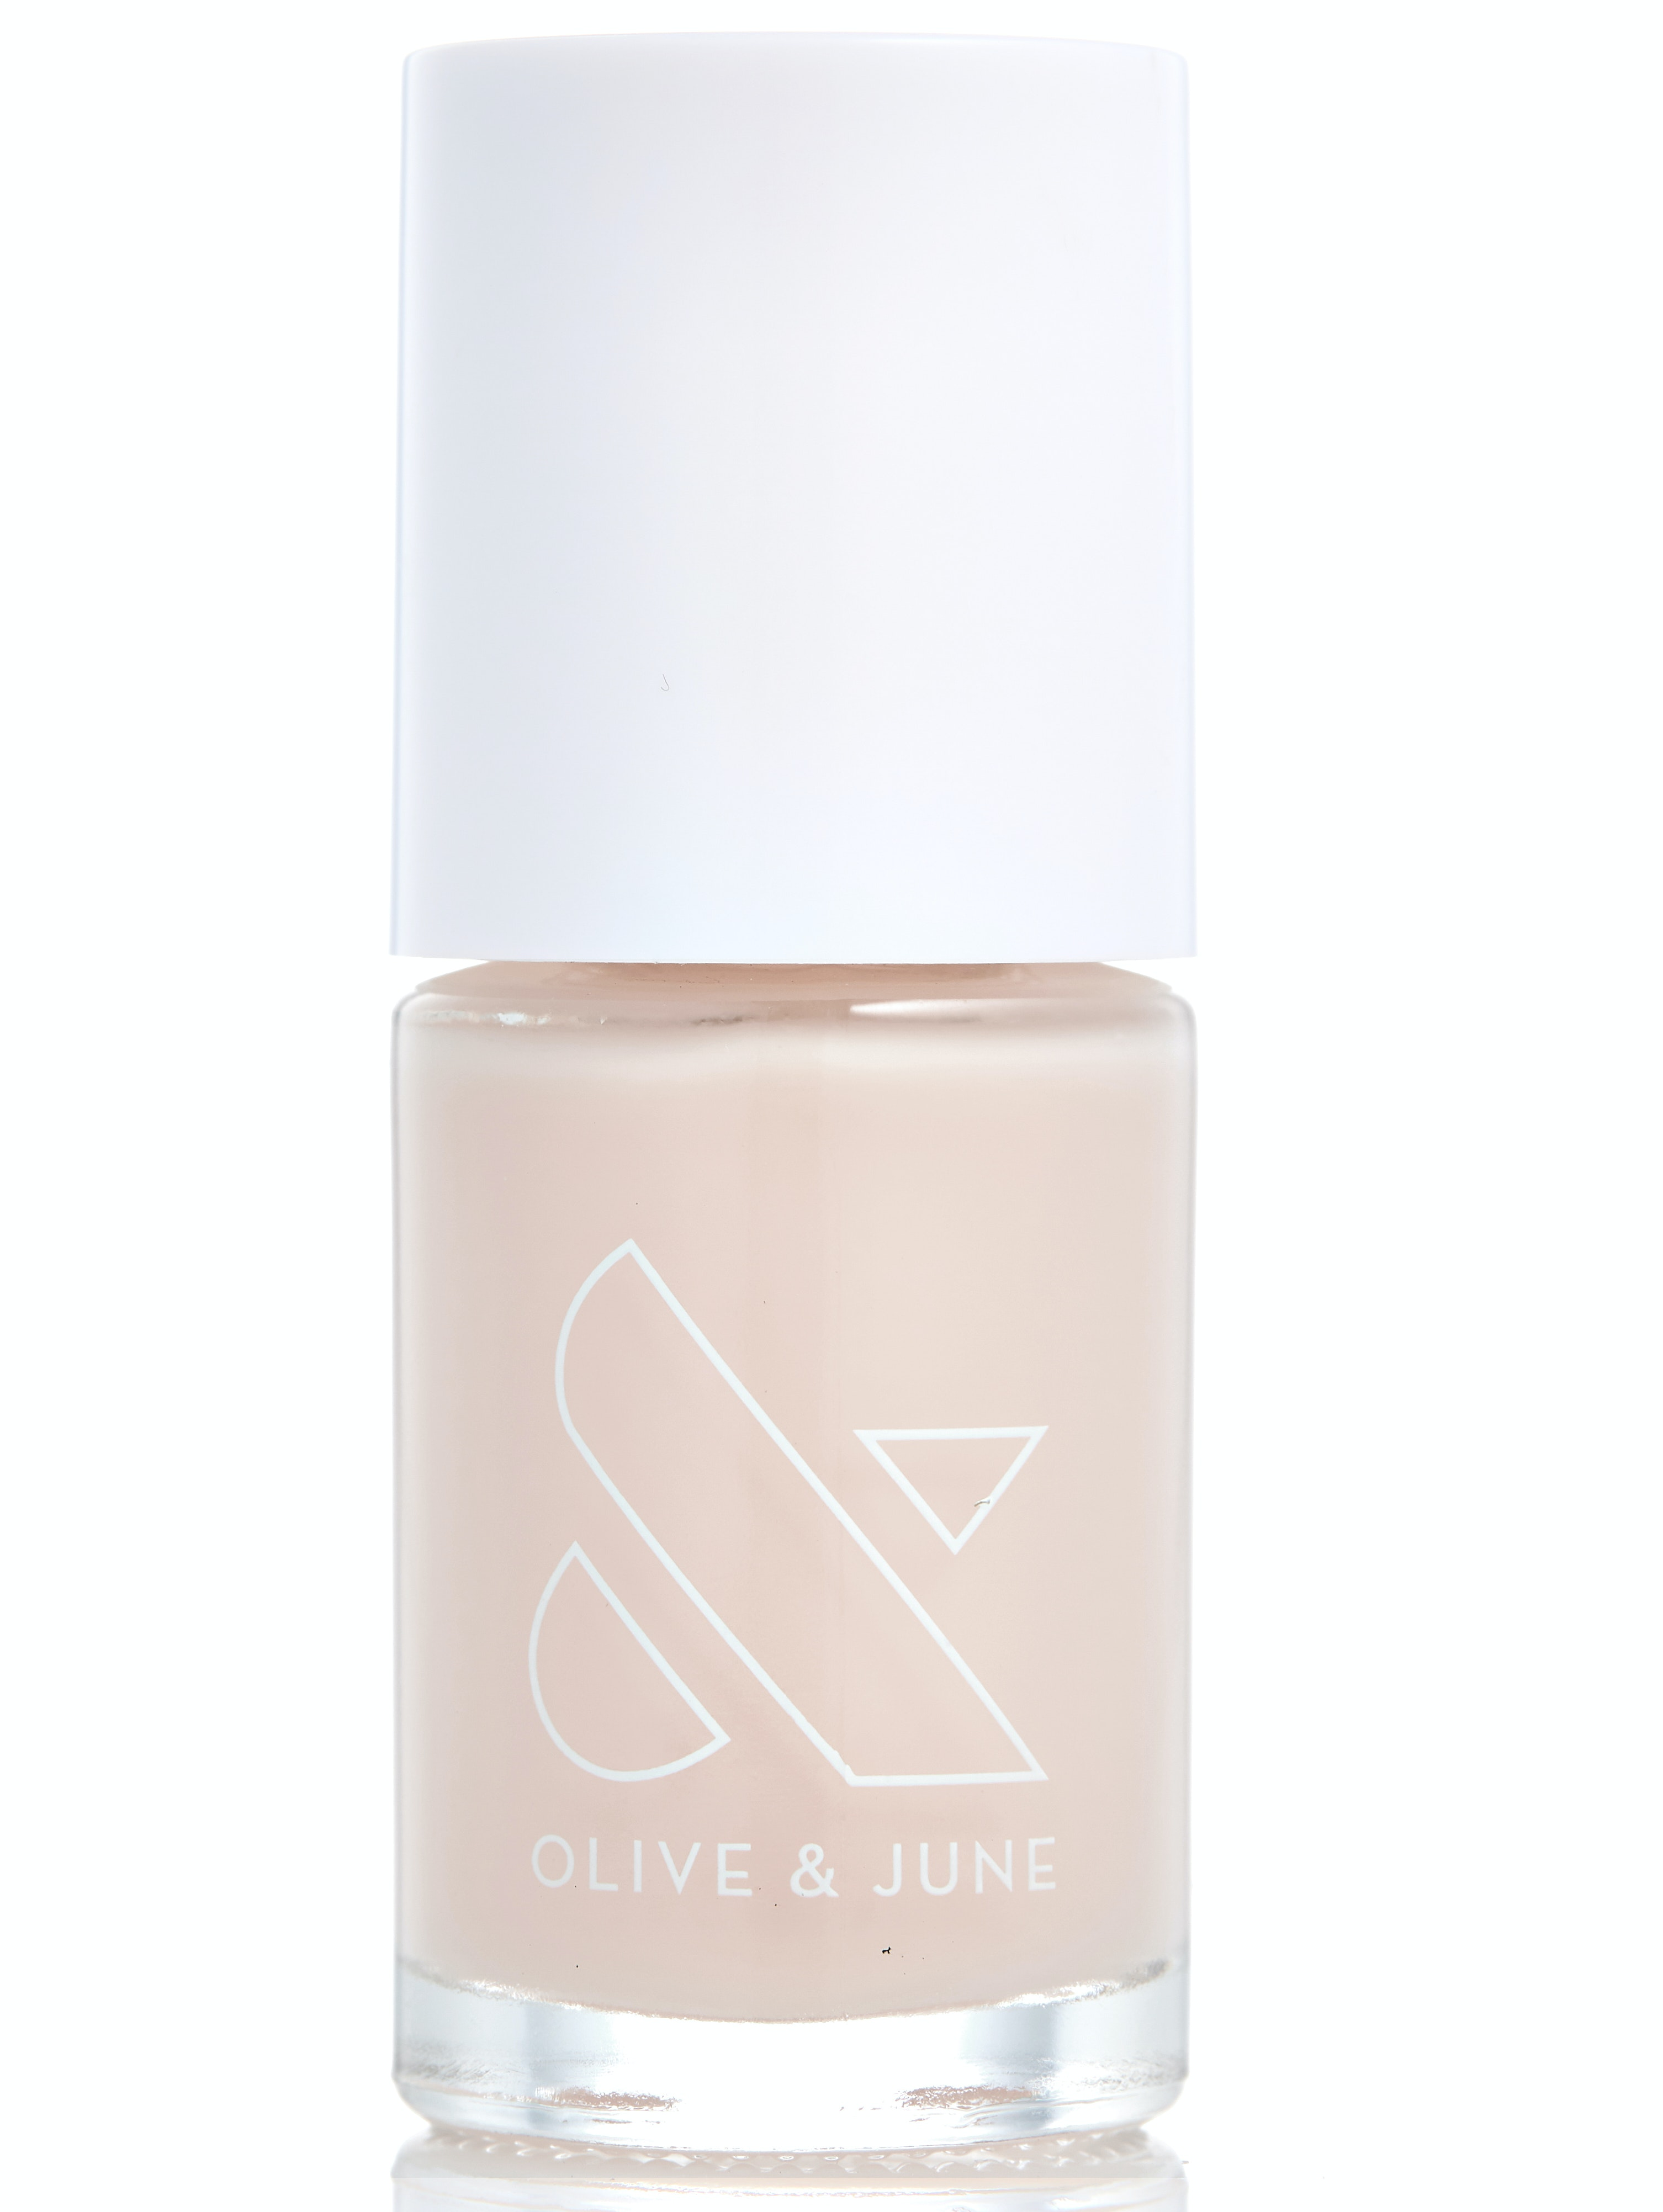 Olive & June nail polish